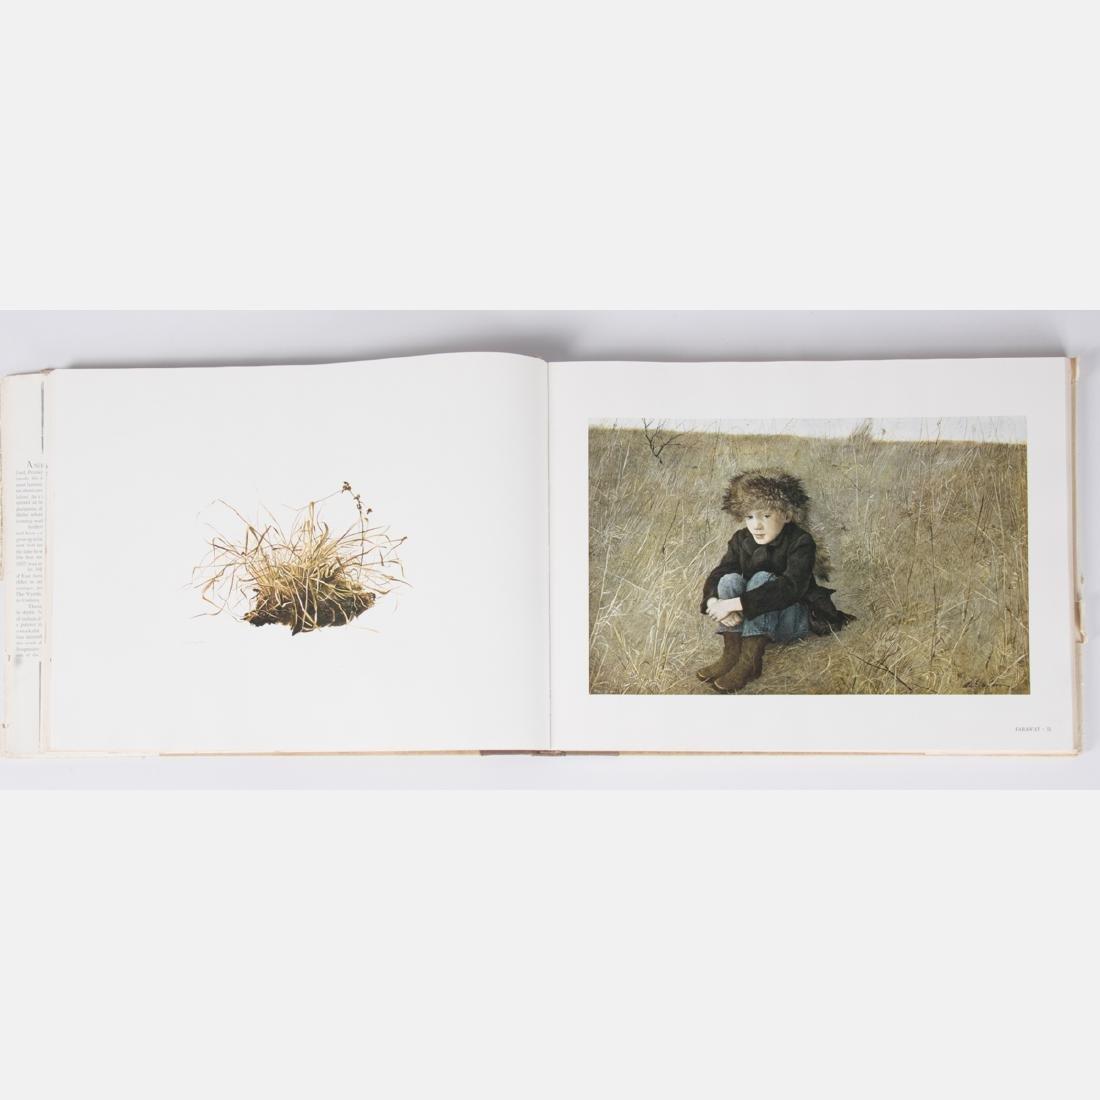 MERYMAN, Richard (1926-2015). Andrew Wyeth. Boston: - 2